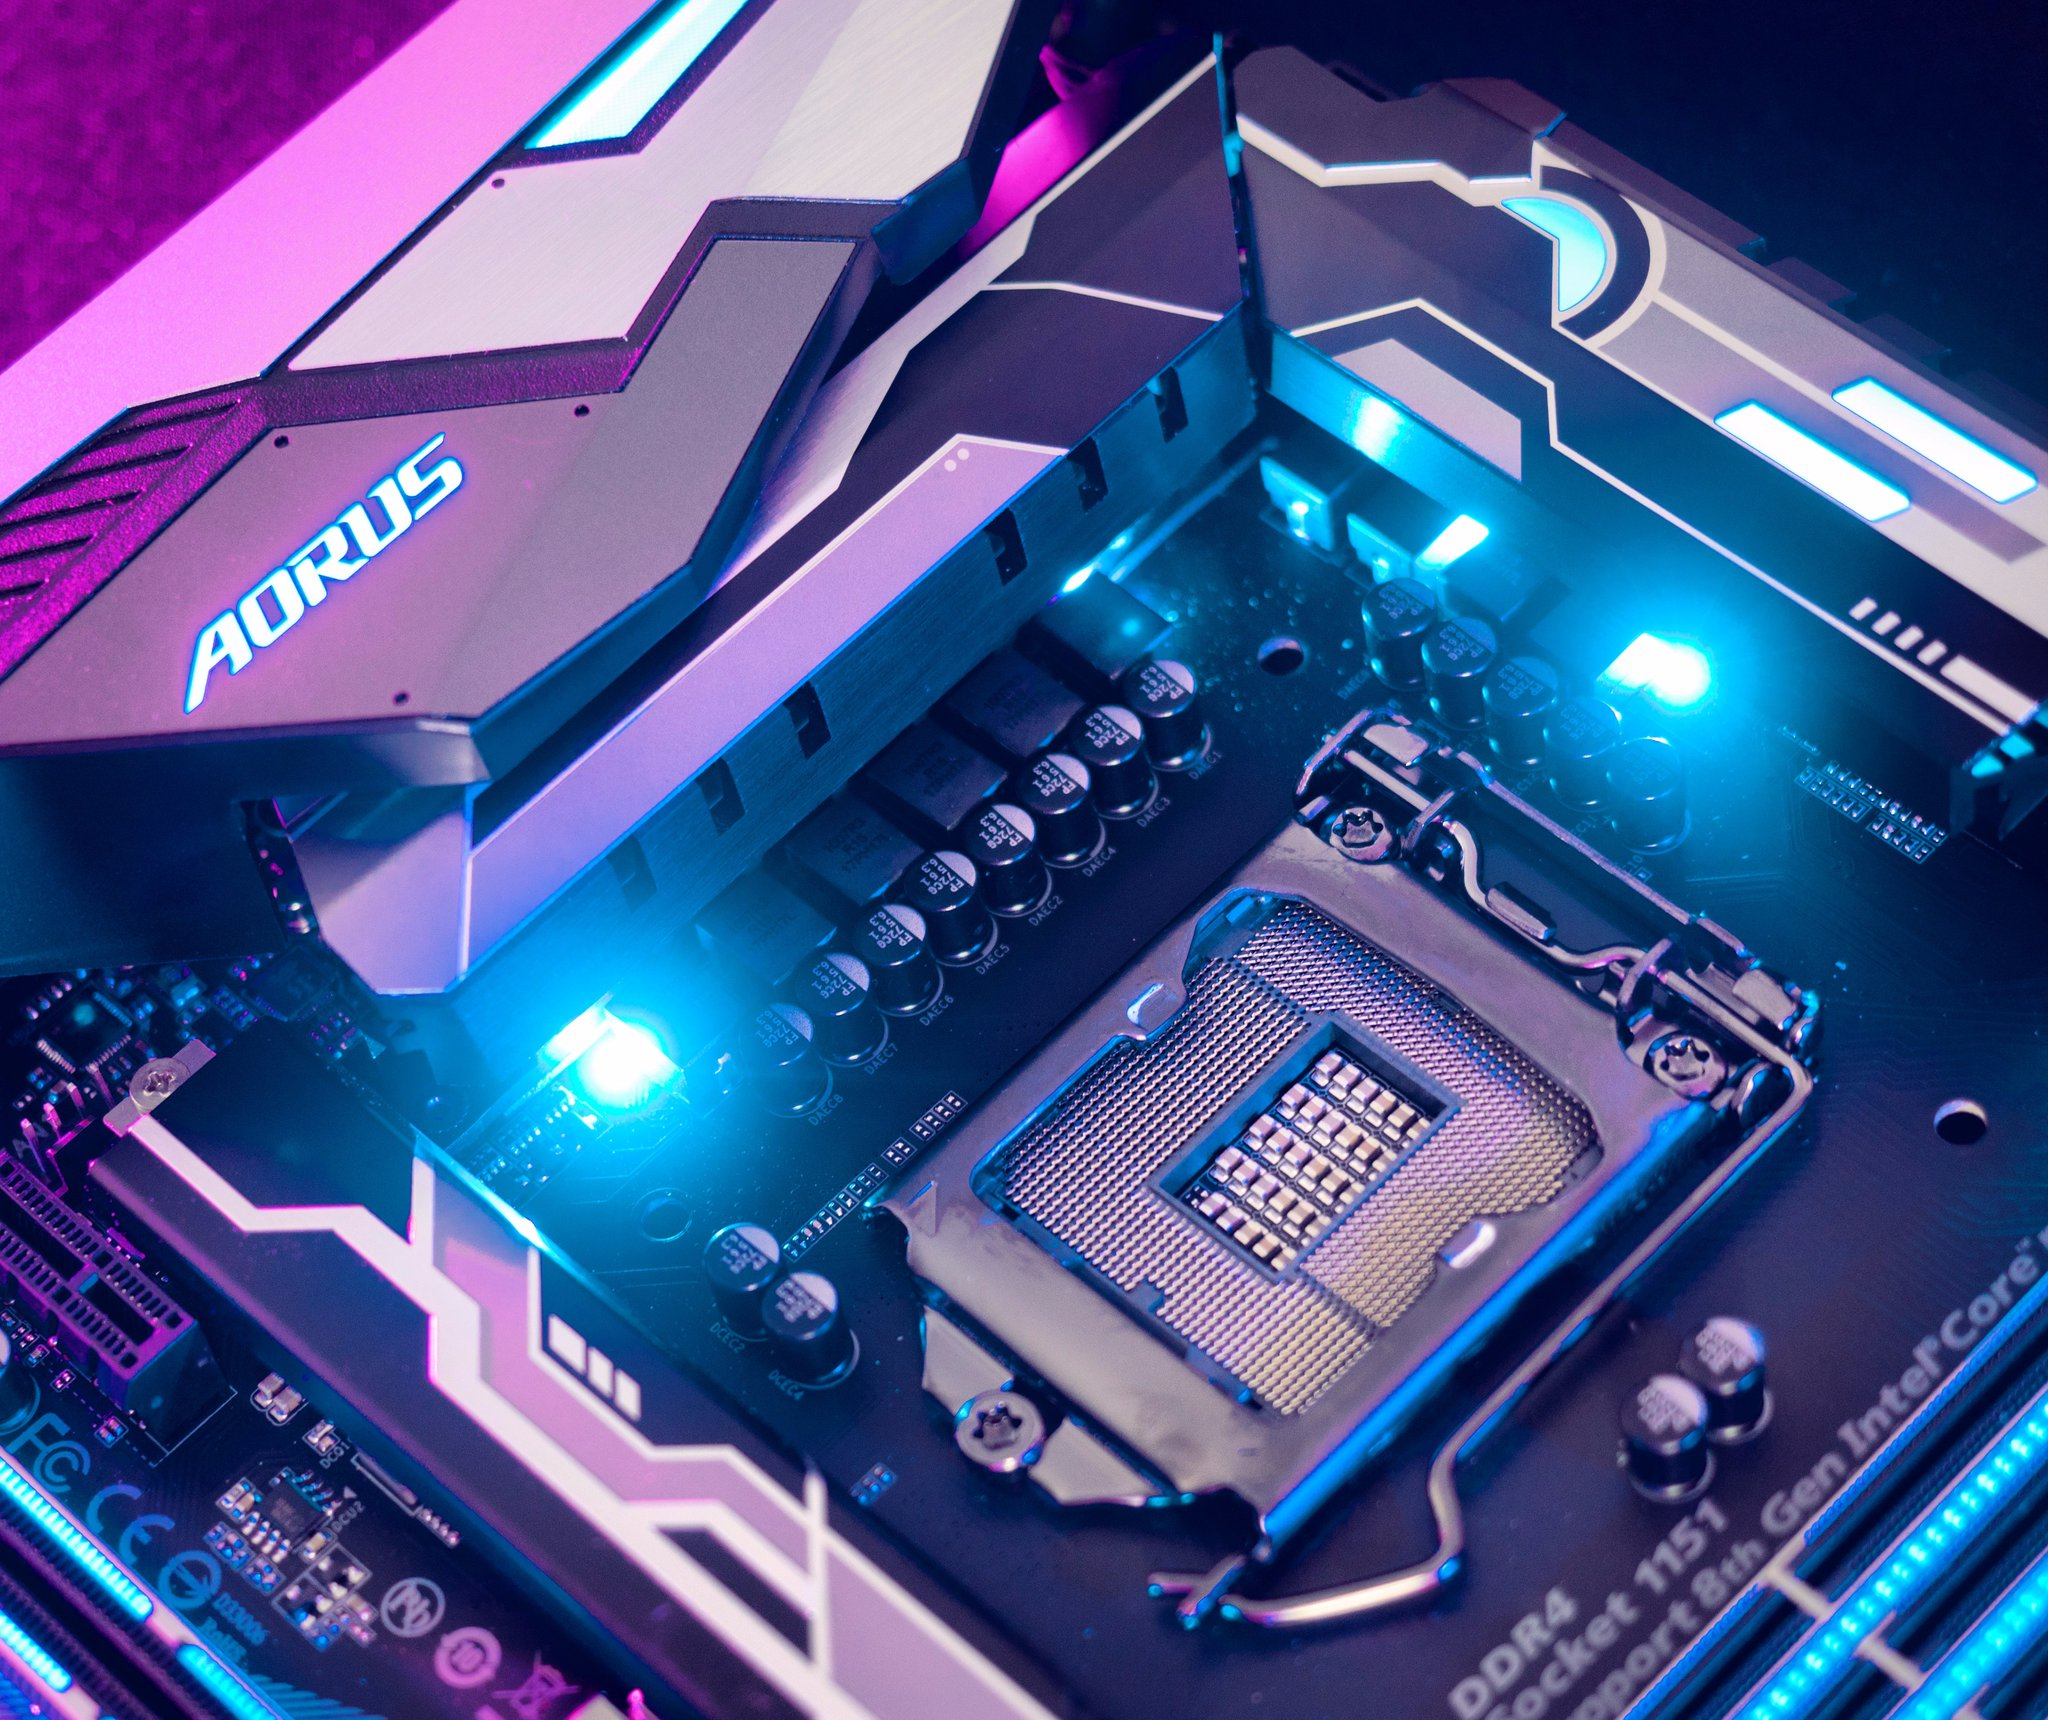 Intel Coffee Lake and Kaby Lake CPUs Use Different LGA Pin